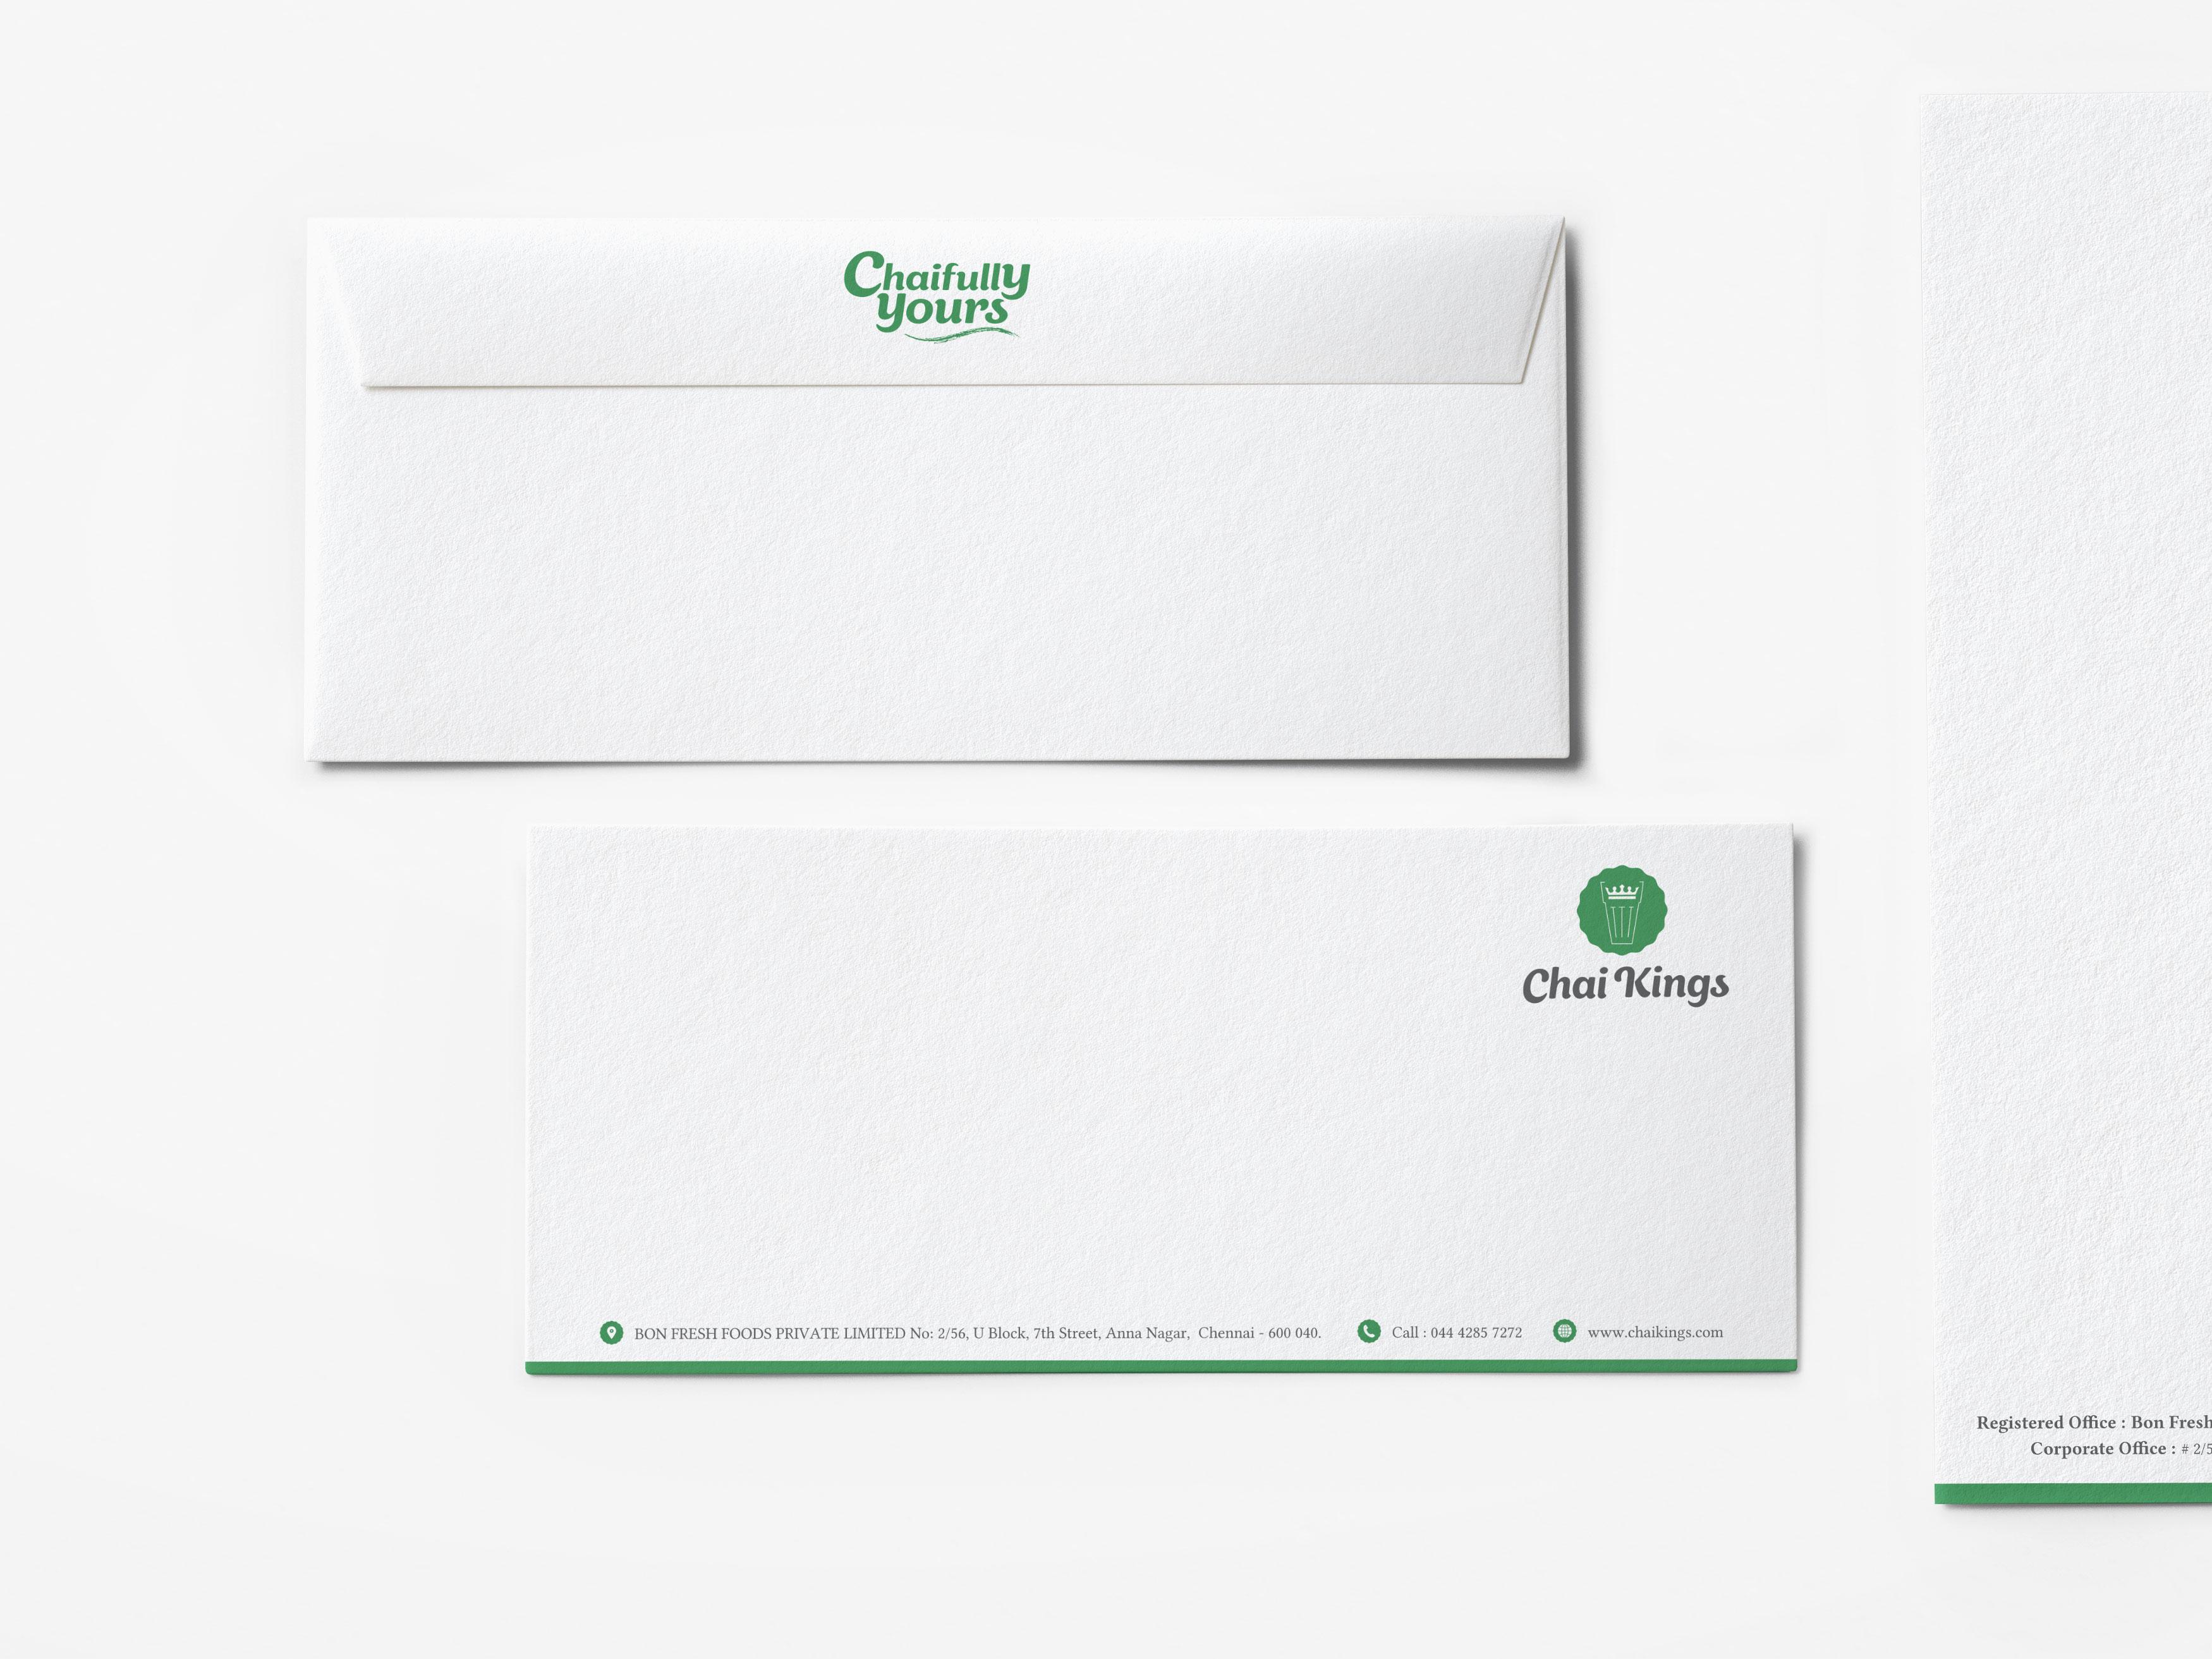 Chai Kings Envelope